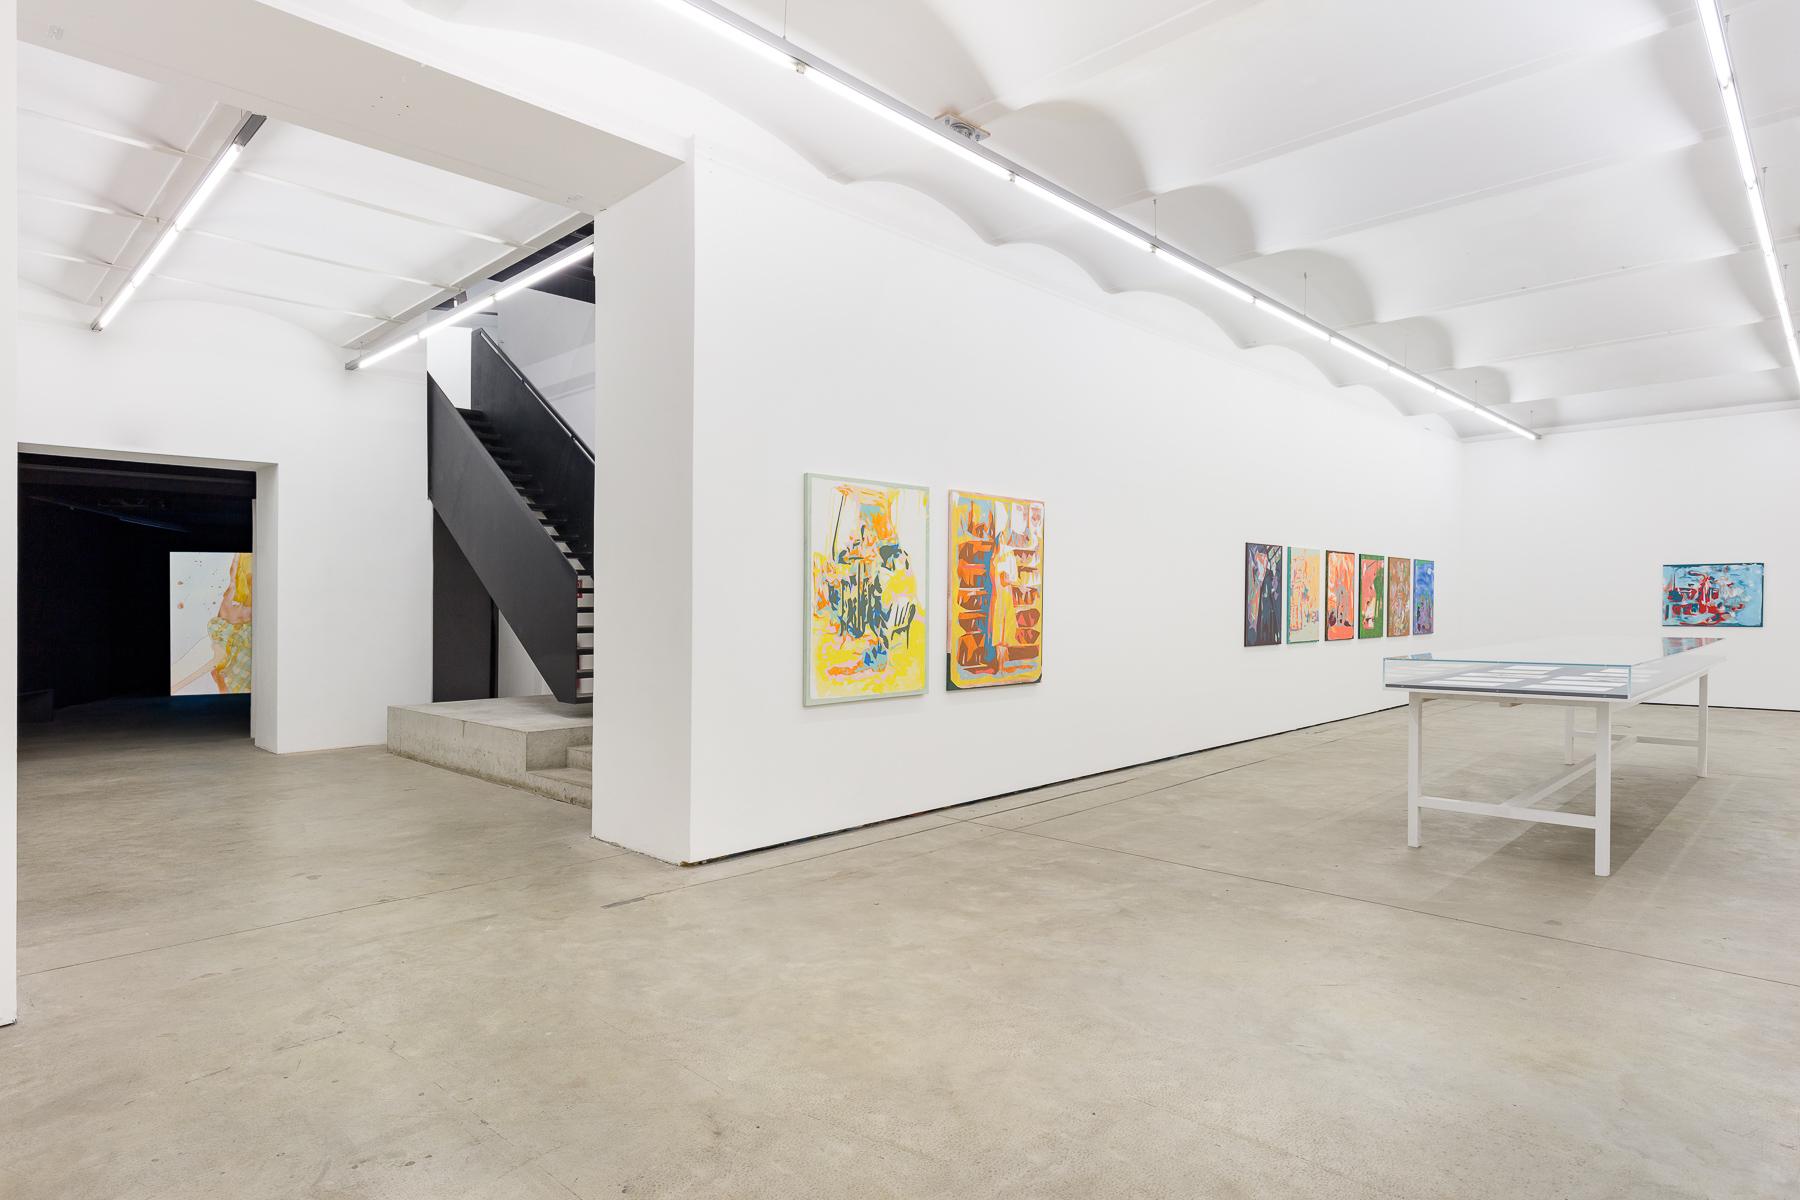 2019_04_Ausstellungsansichten_Francis-Ruyter_hurricane-time-image_024_web.jpg